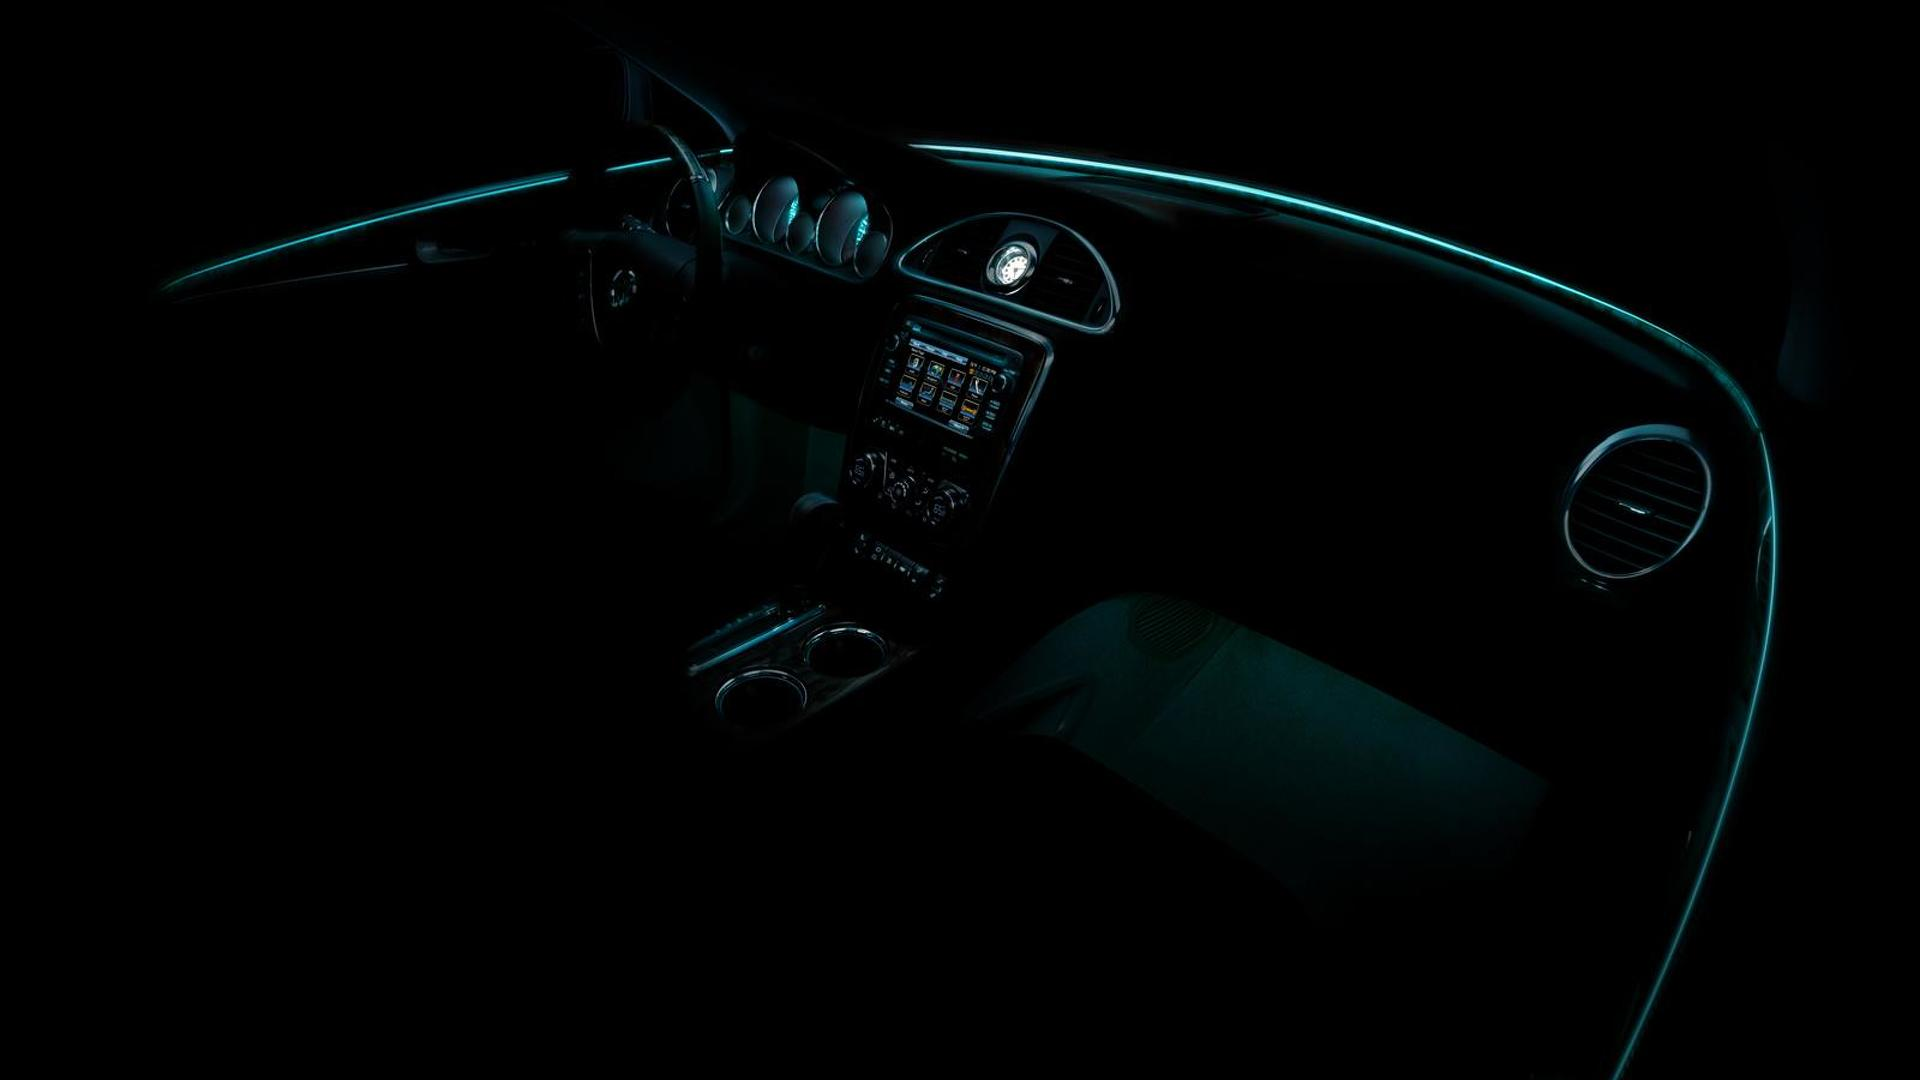 2013 Buick Enclave facelift revealed [video added]